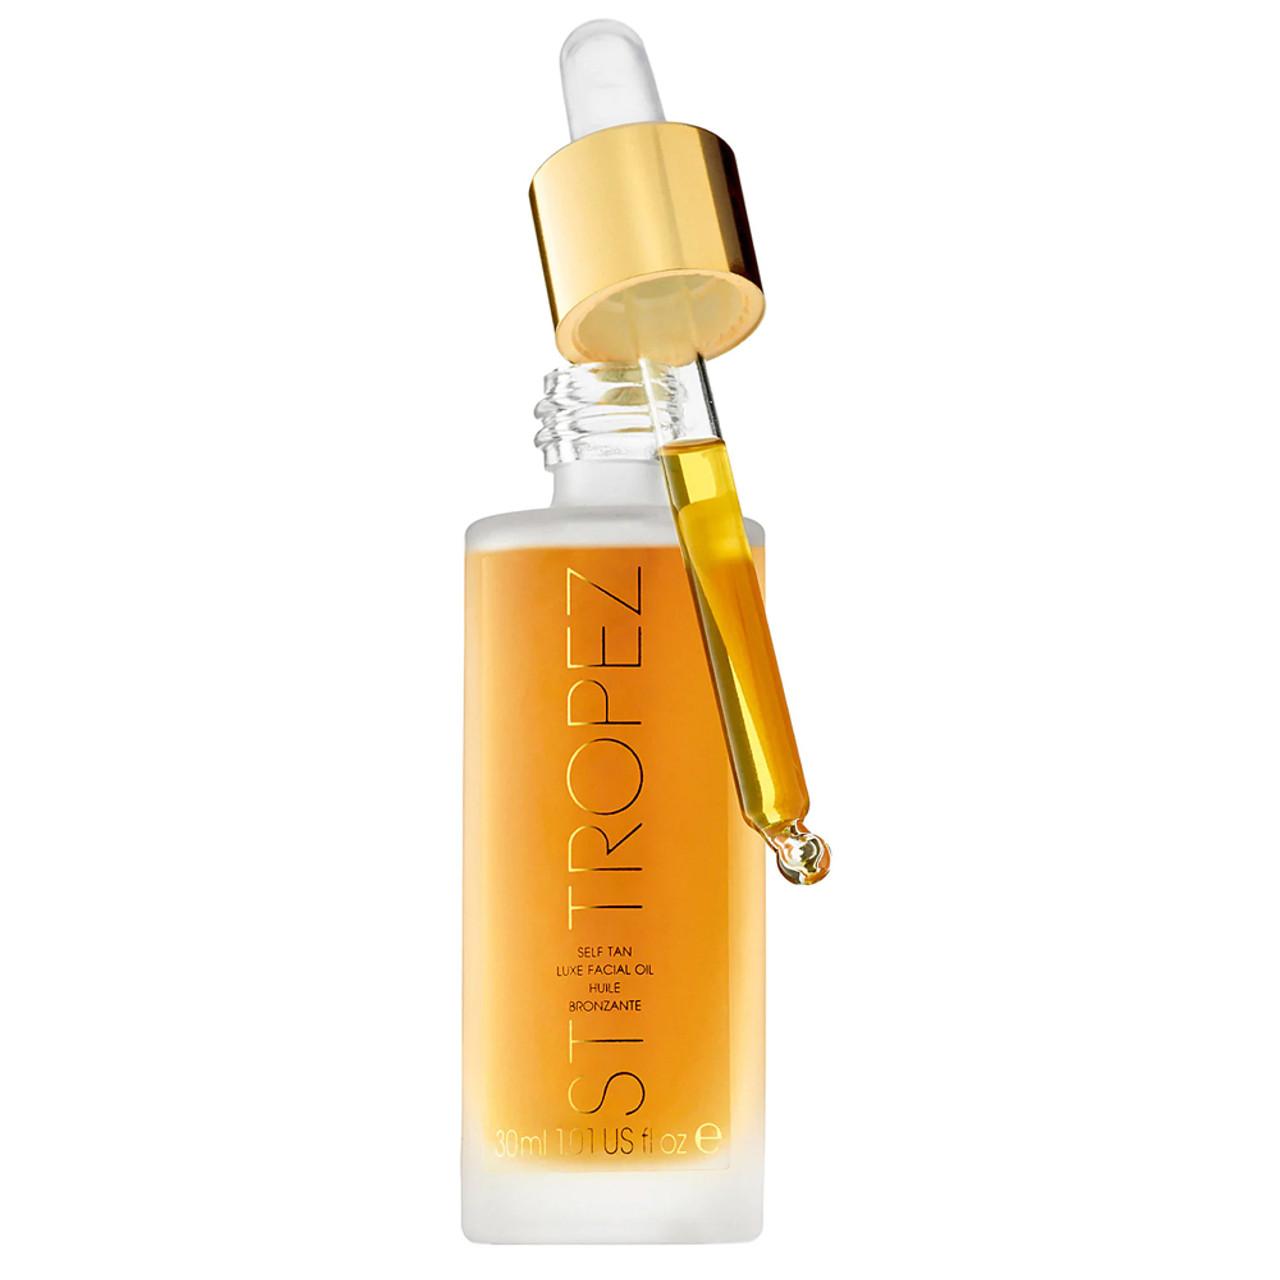 St Tropez Self Tan Luxe Dry Facial Oil